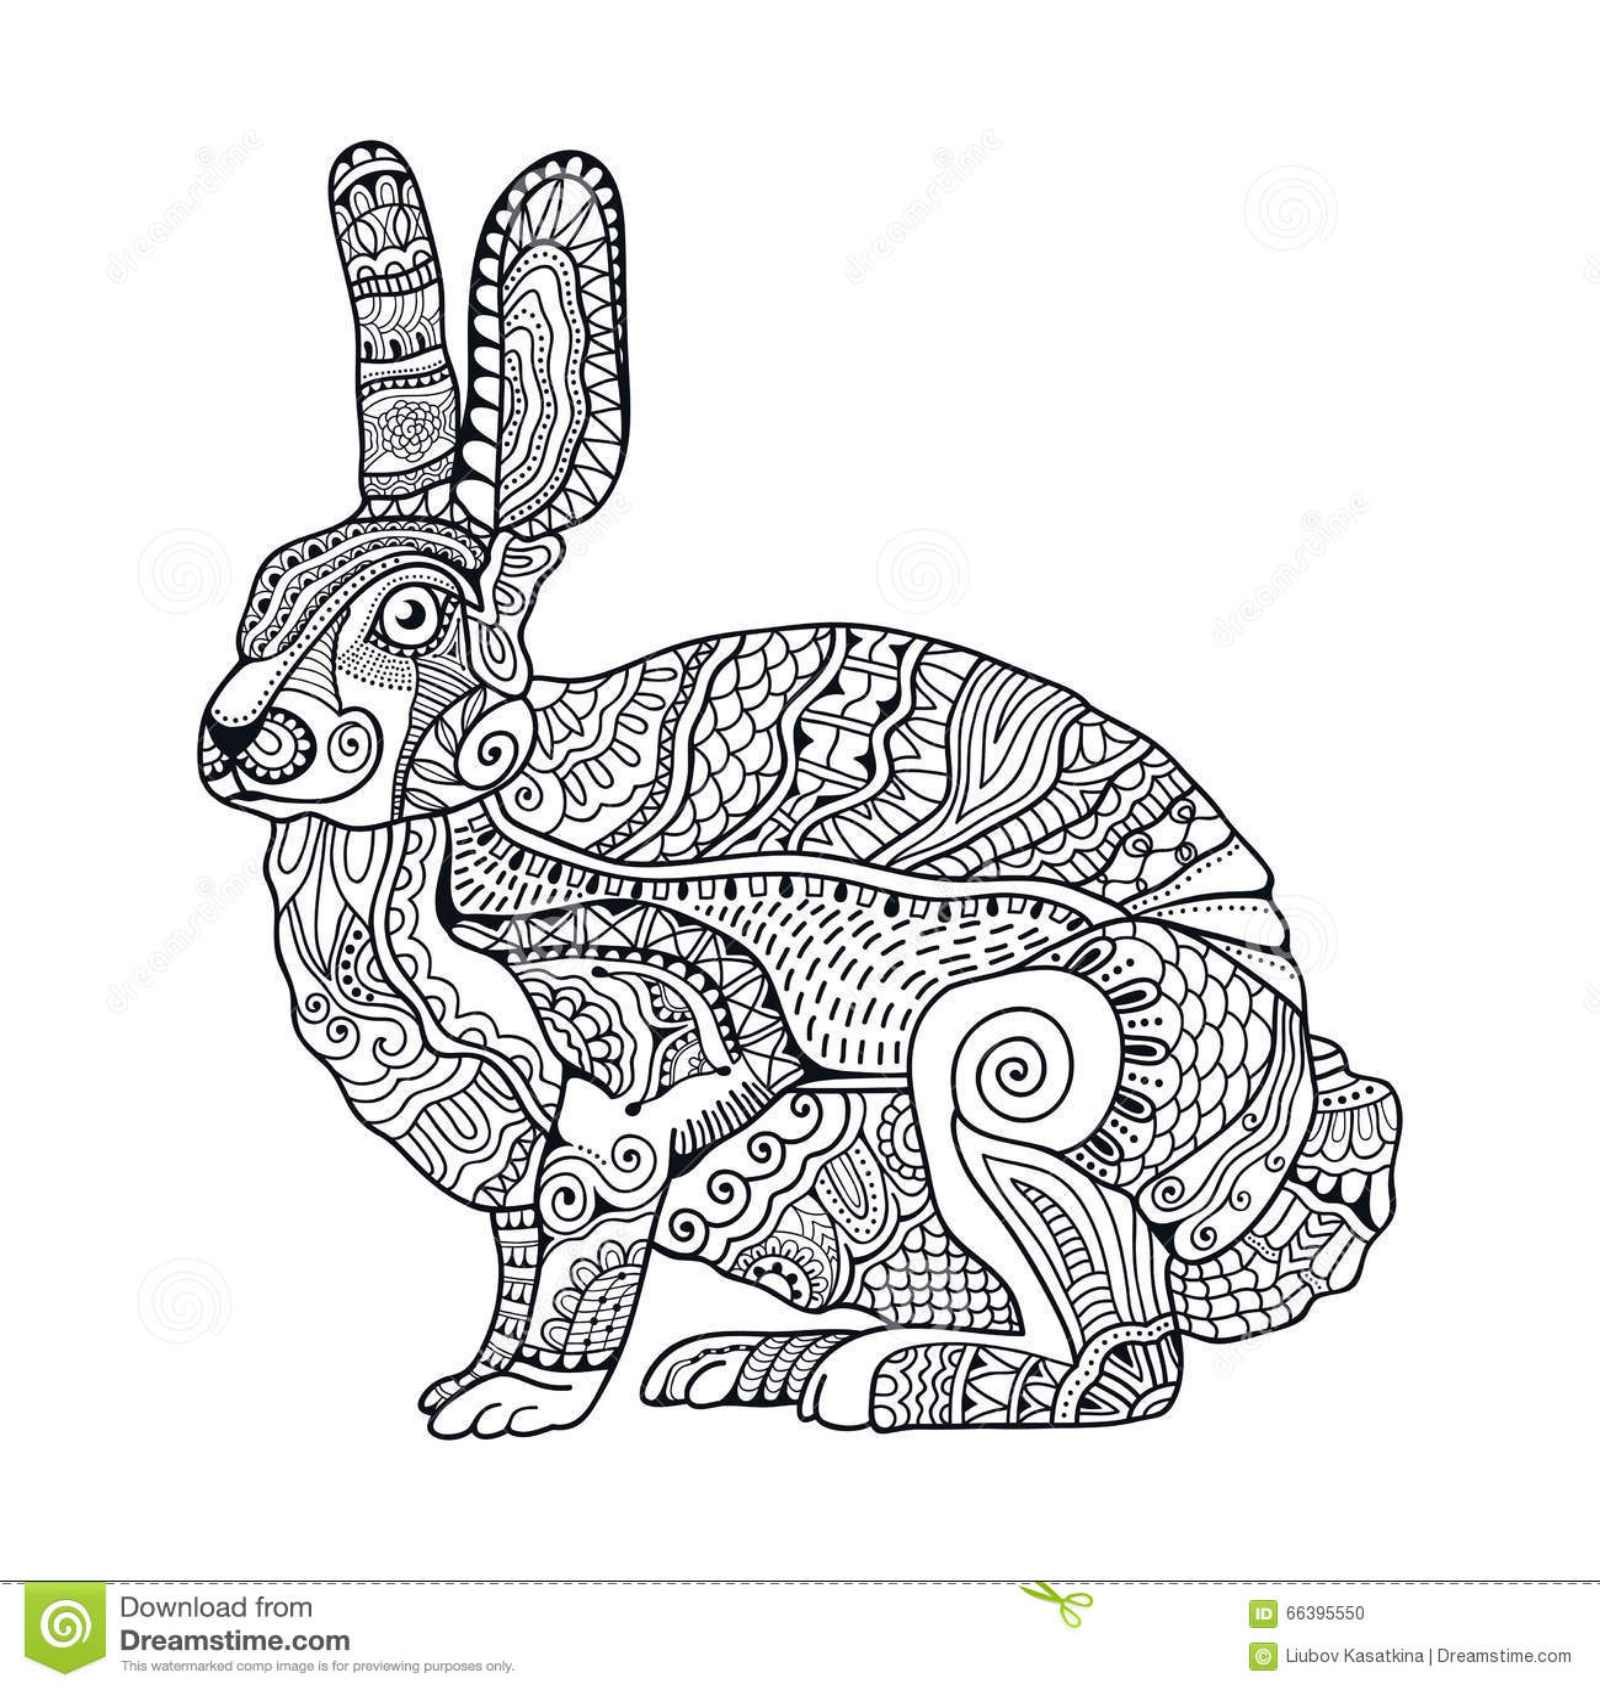 Doodle Vector Illustration For Easter Stock Image 66395550